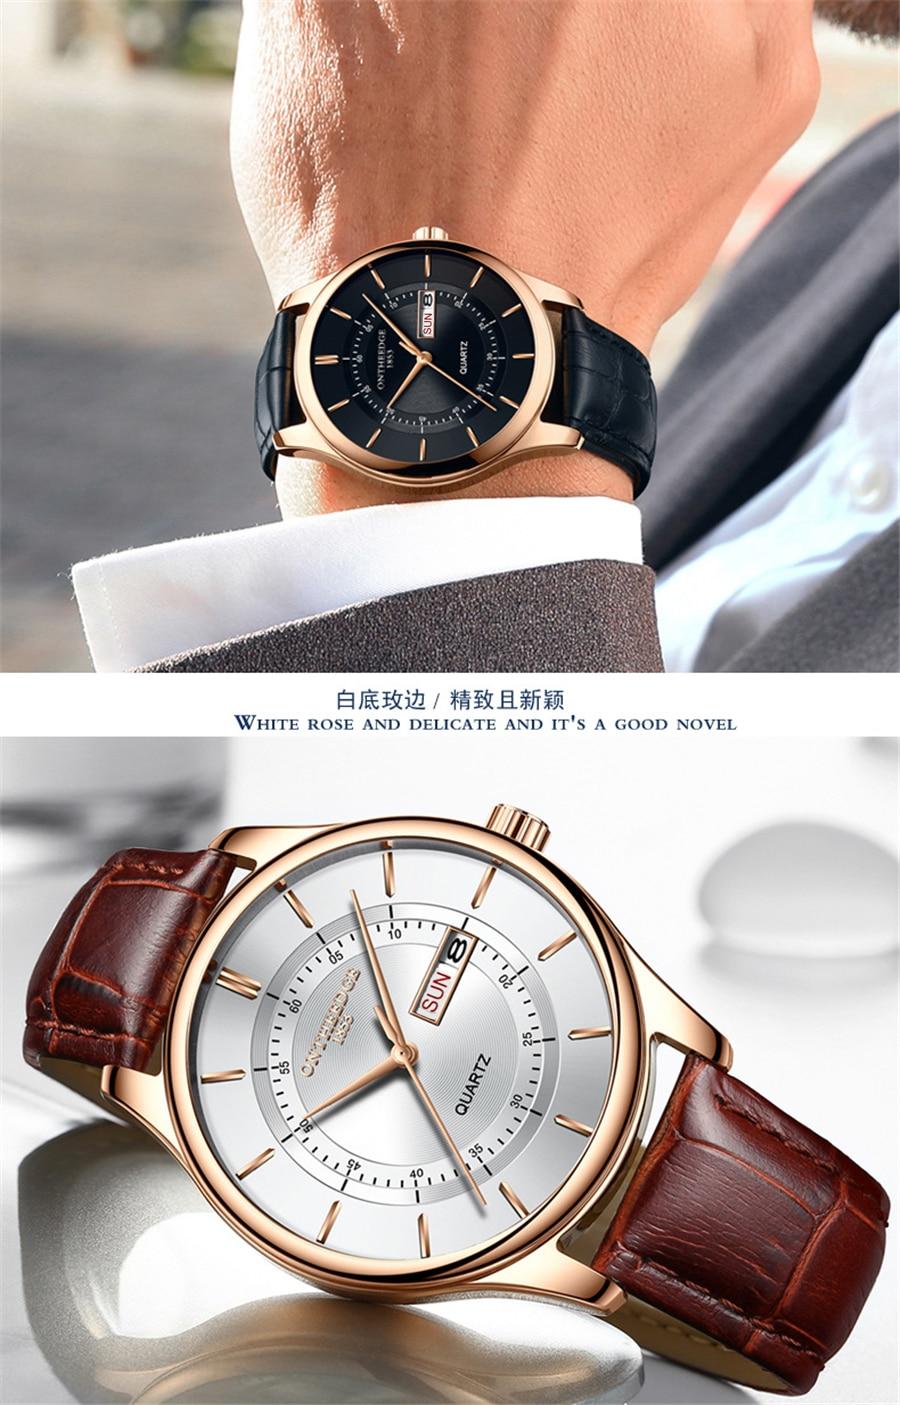 HTB1y6qMi9tYBeNjSspkq6zU8VXaK High Quality Rose Gold Dial Watch Men Leather Waterproof 30M Watches Business Fashion Japan Quartz Movement Auto Date Male Clock